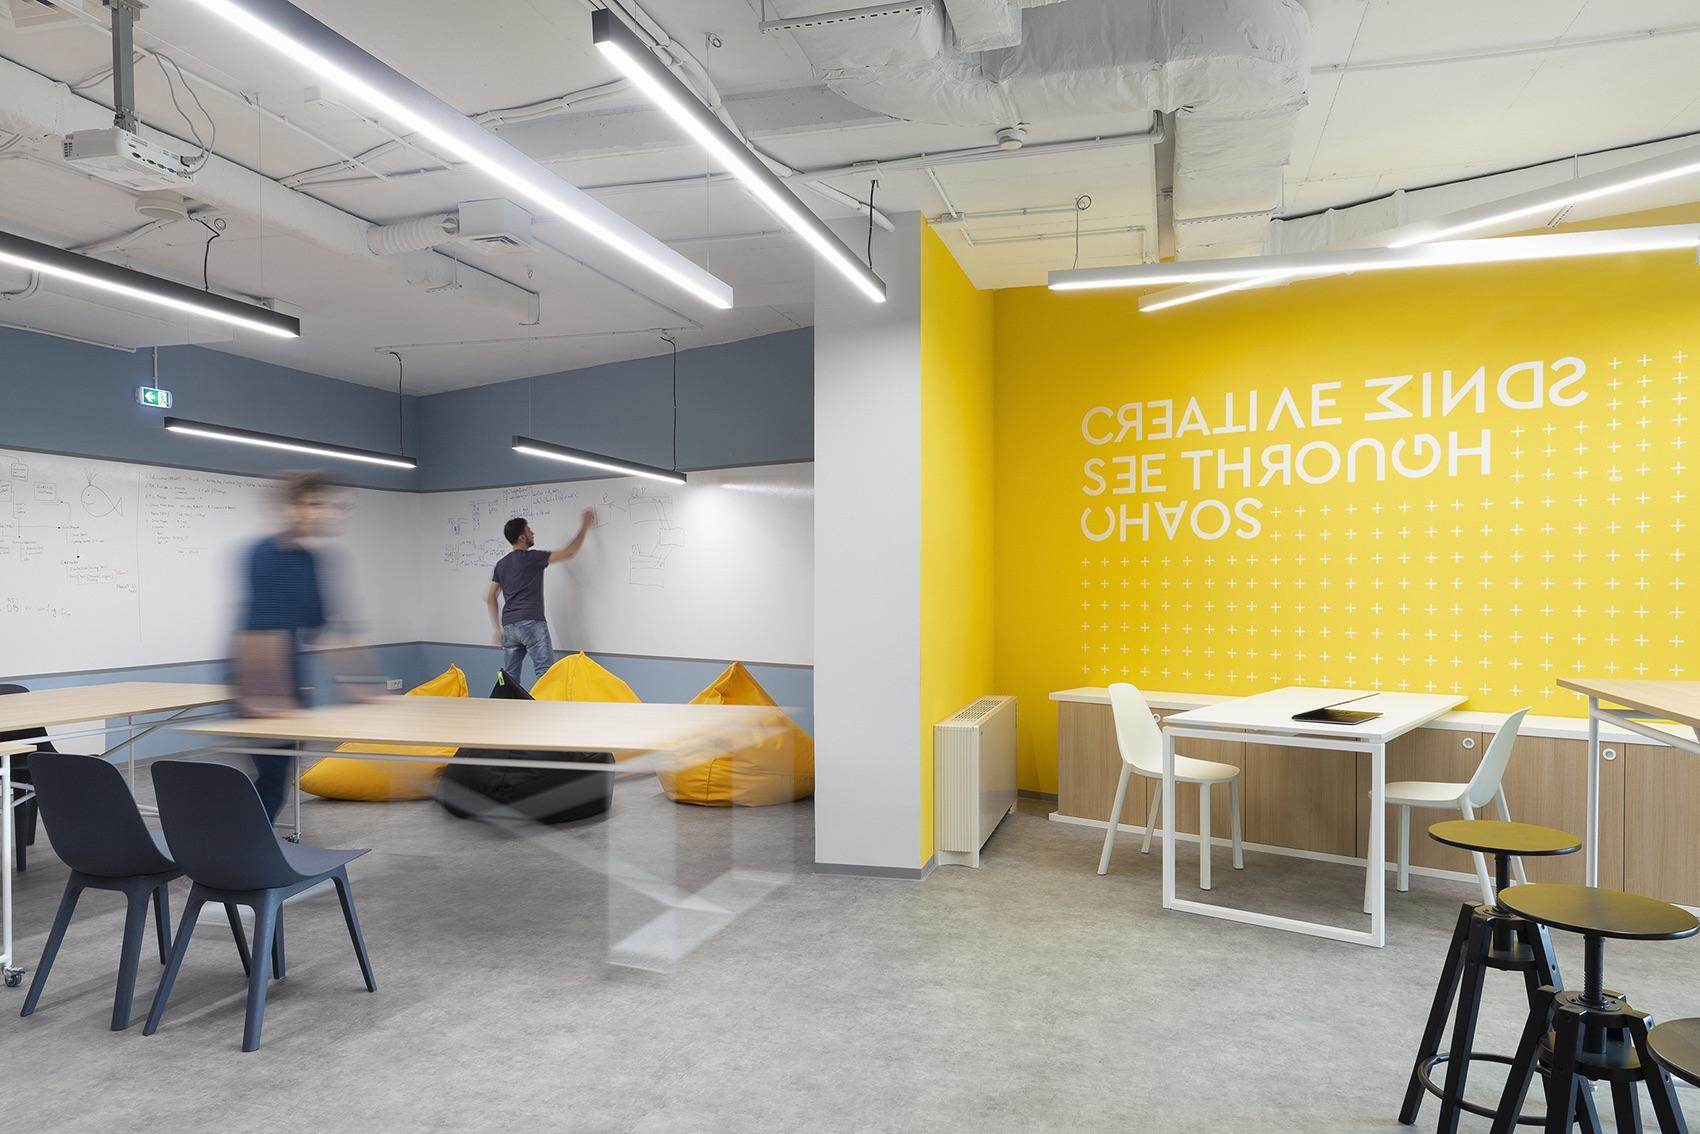 innovative home office decorating ideas | A Look Inside Accedia's Modern New Sofia Office - Officelovin'